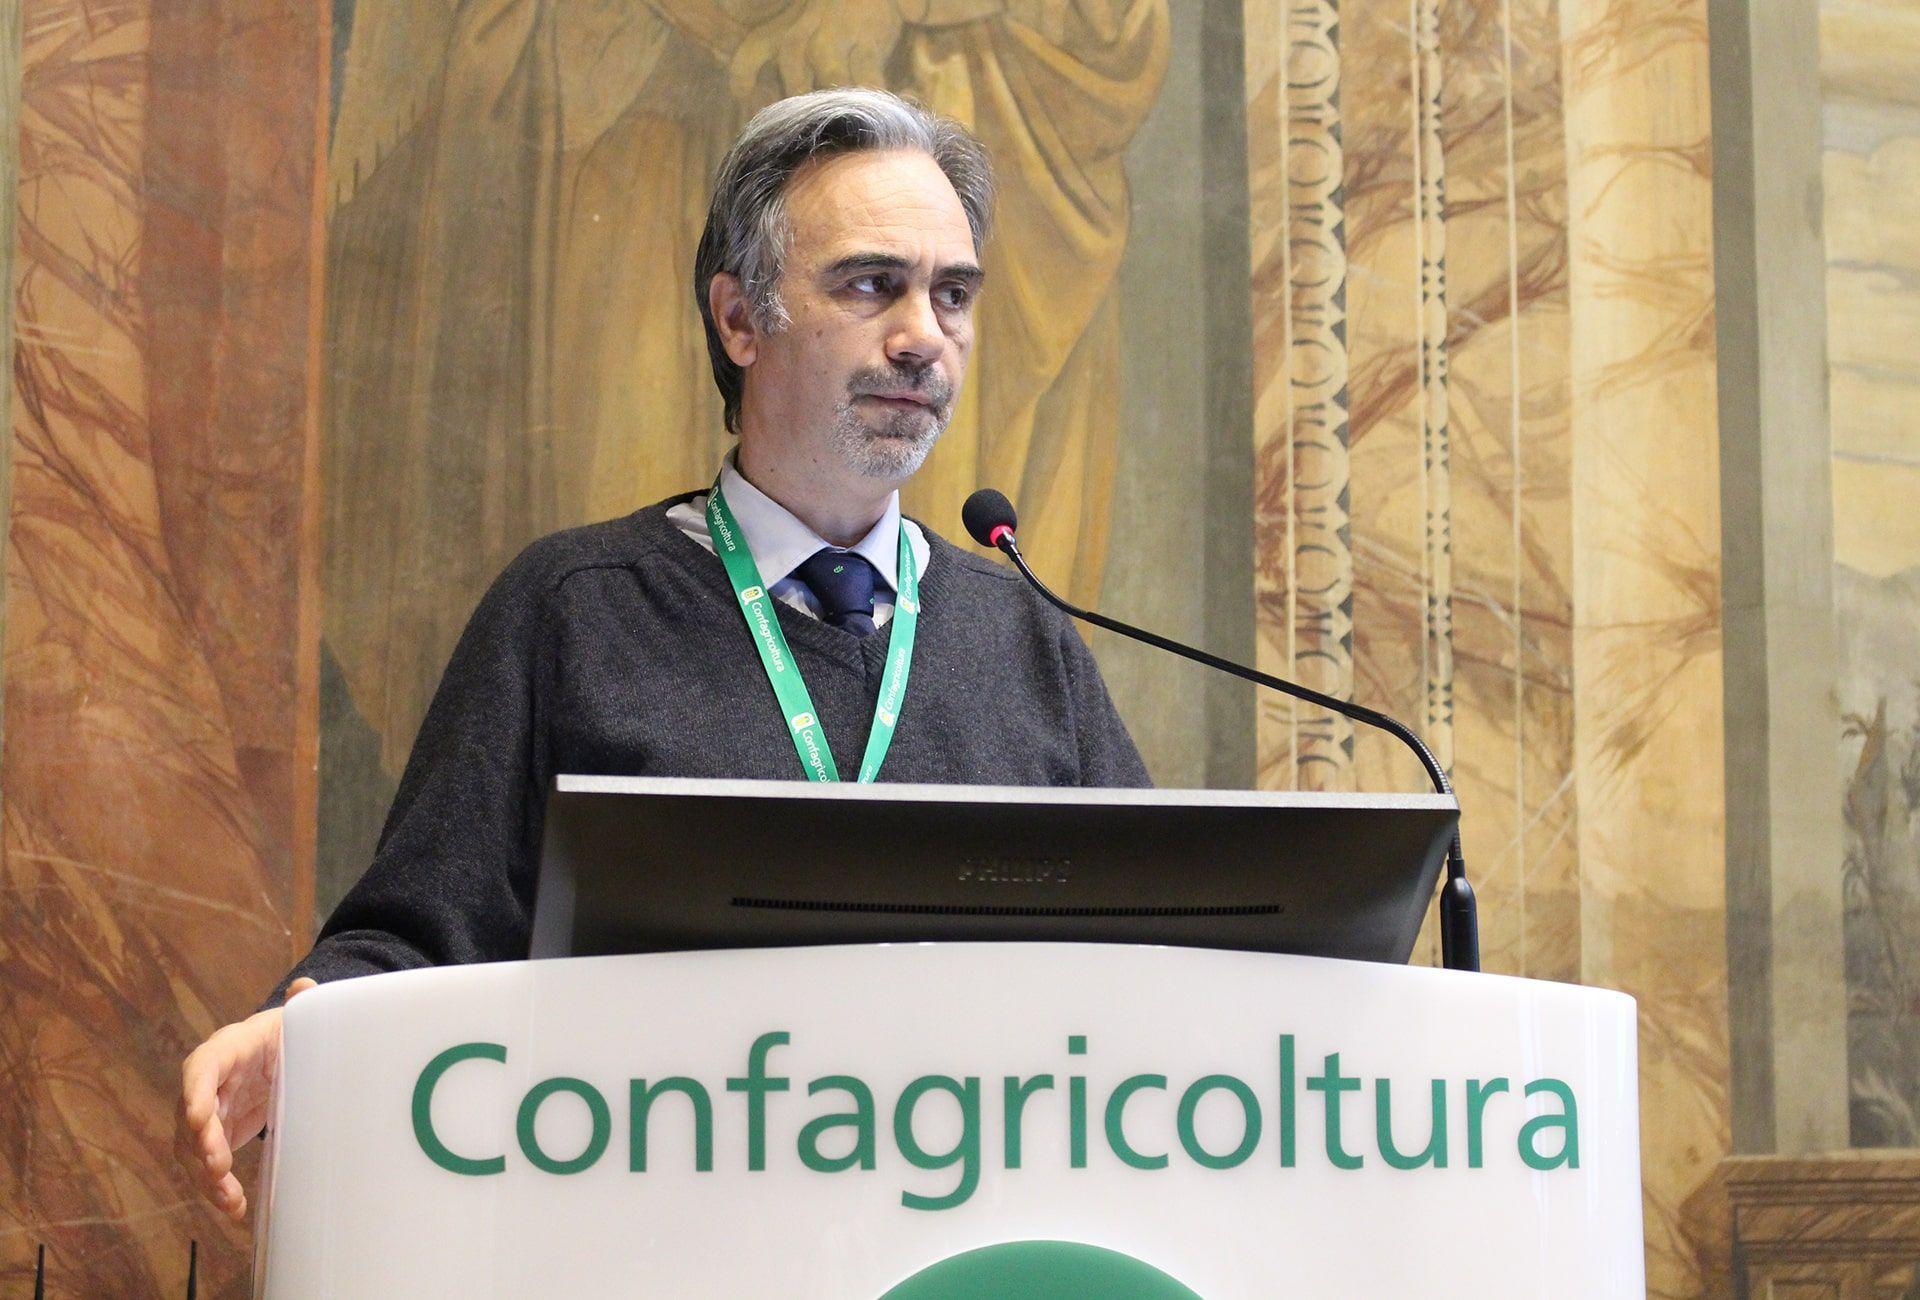 Luigi Tozzi (Confagricoltura, Italy)